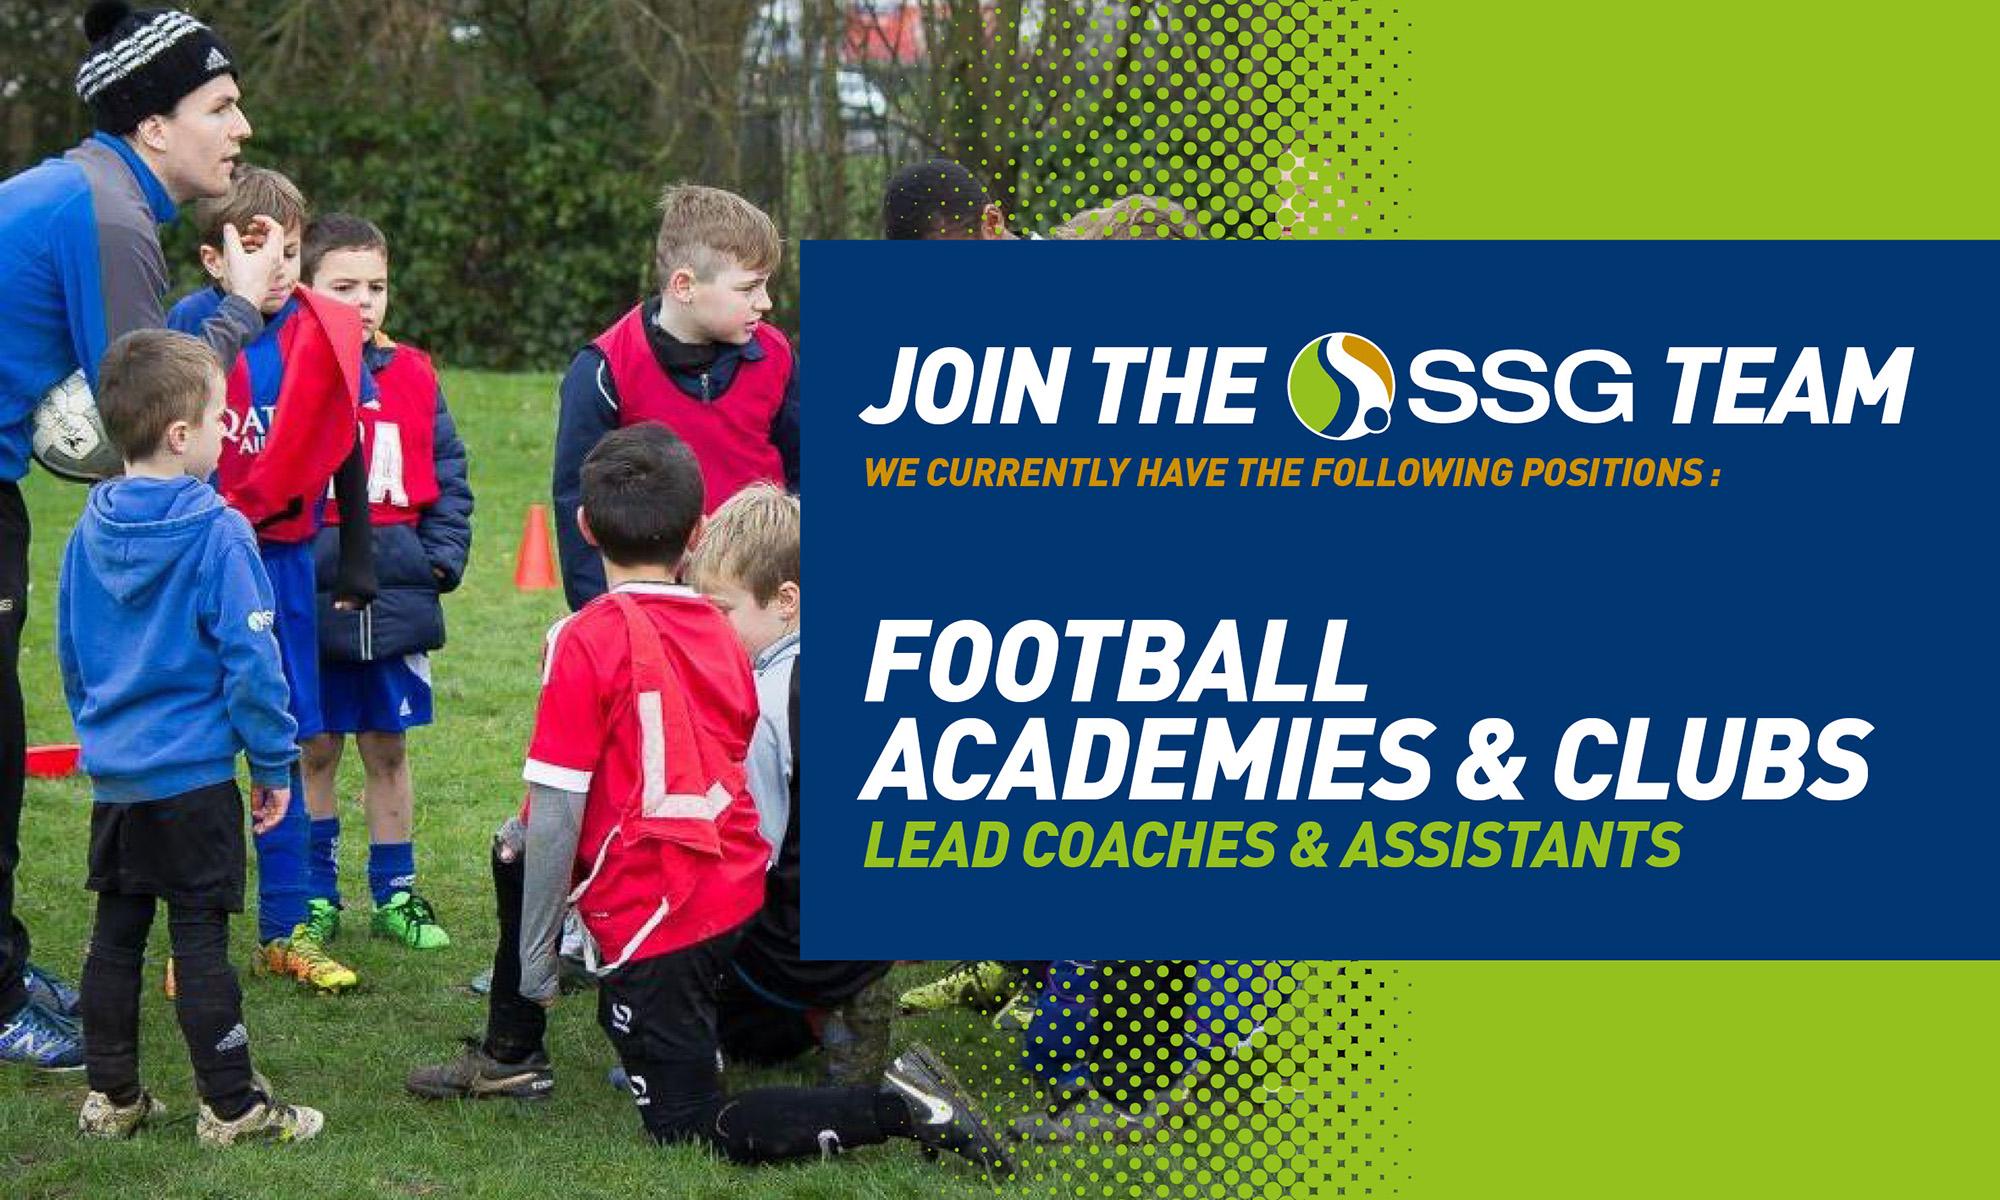 SSG_Job_FB_Football